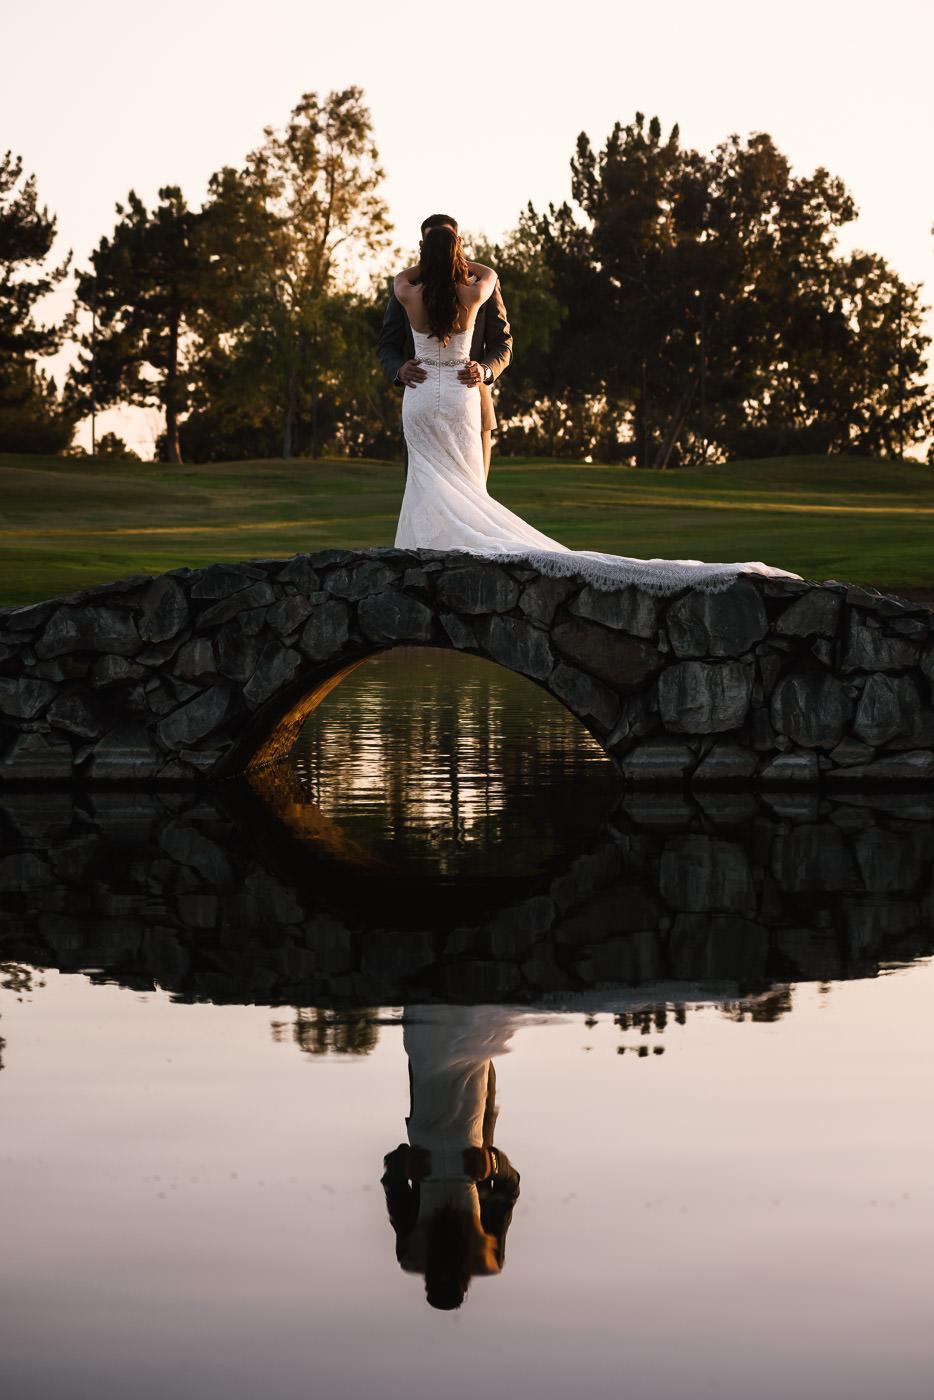 Romantic wedding photography on the stone bridge of the Alta Vista Country Club.